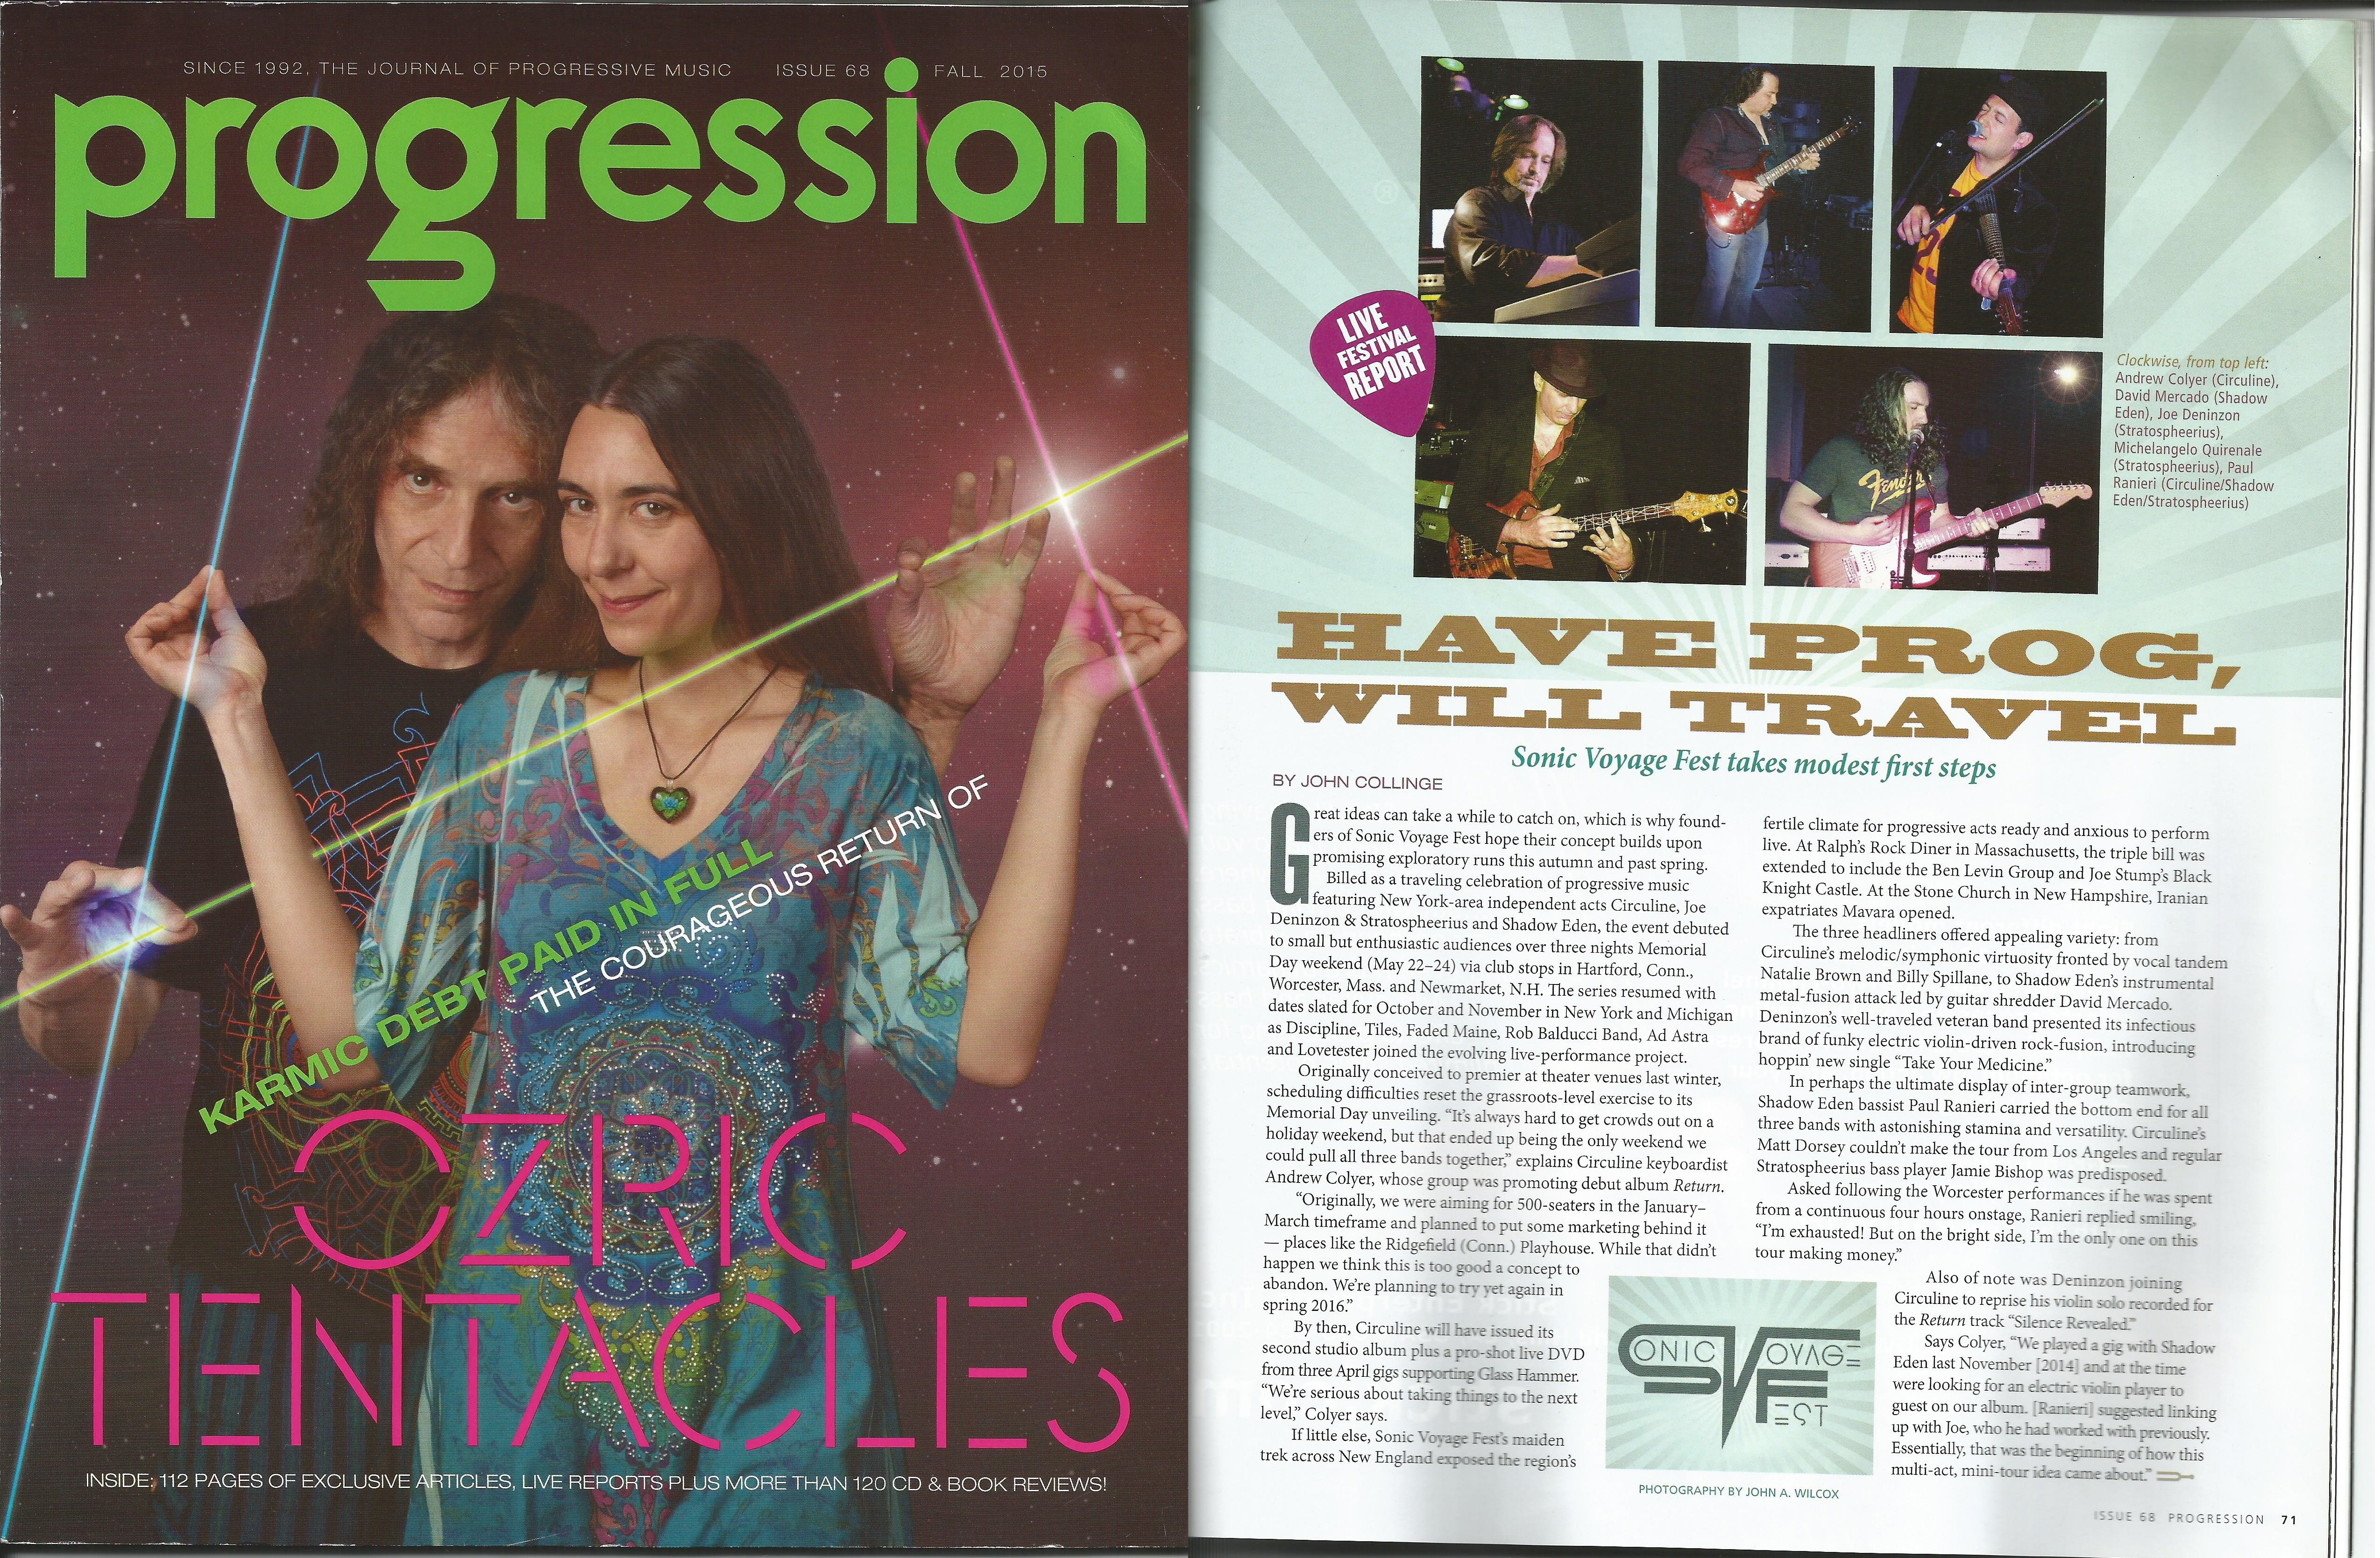 Progression-Magazine-Fall2015-Cover-SVF-v1